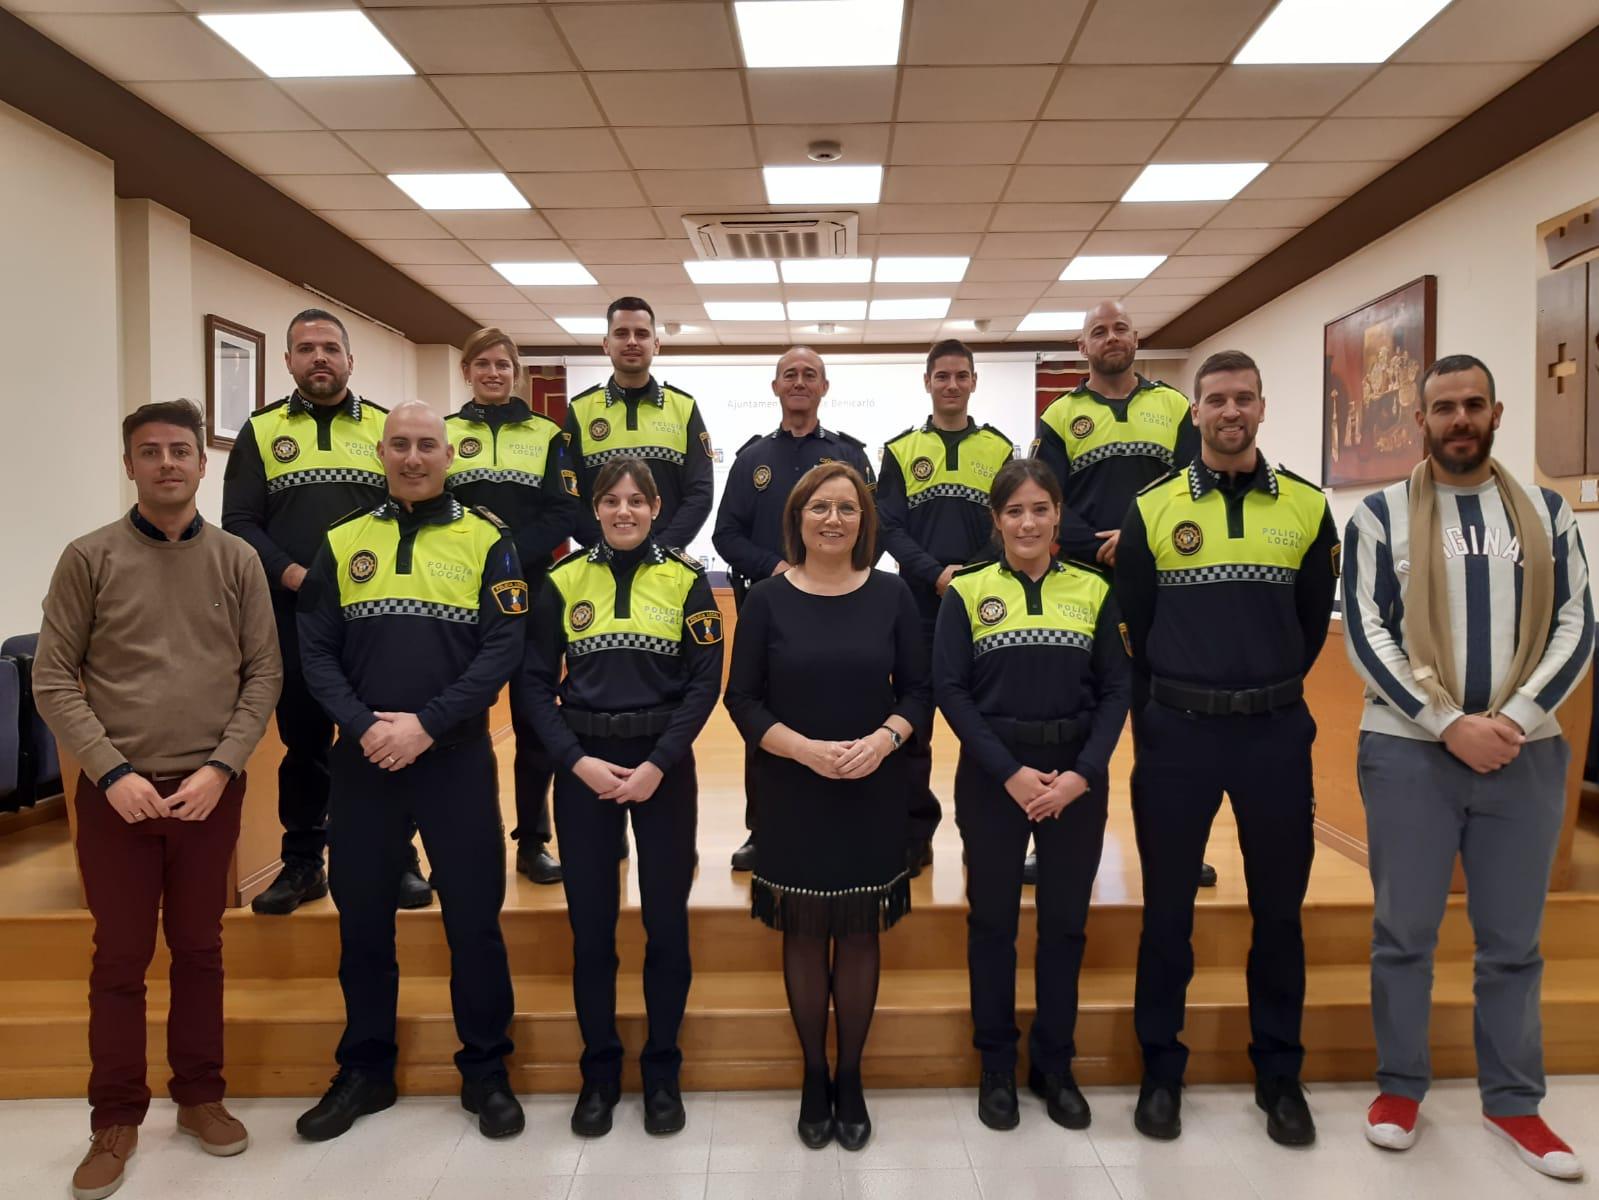 Nou agents s'incorporen al cos de la Policia Local de Benicarló